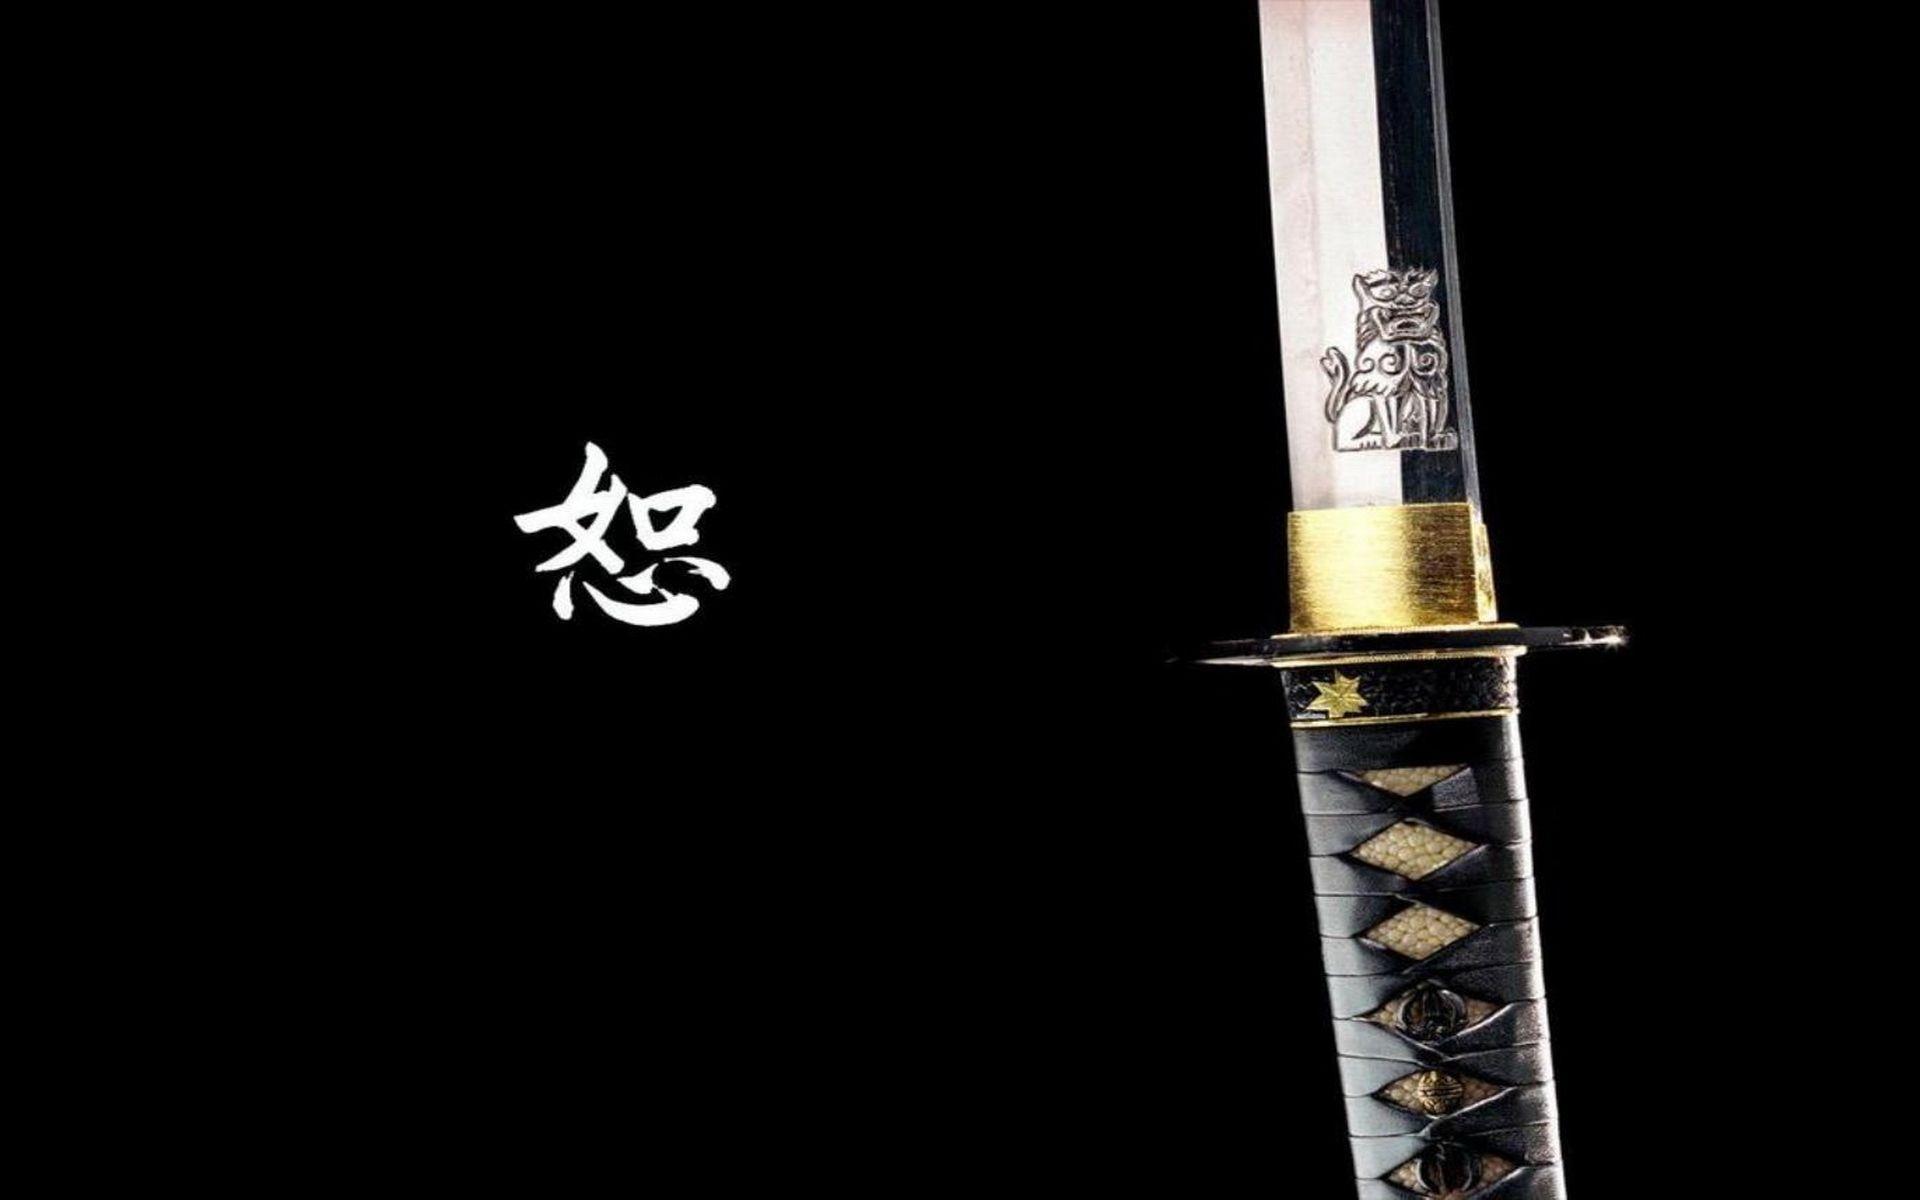 japanese katana wallpaper hd - photo #8